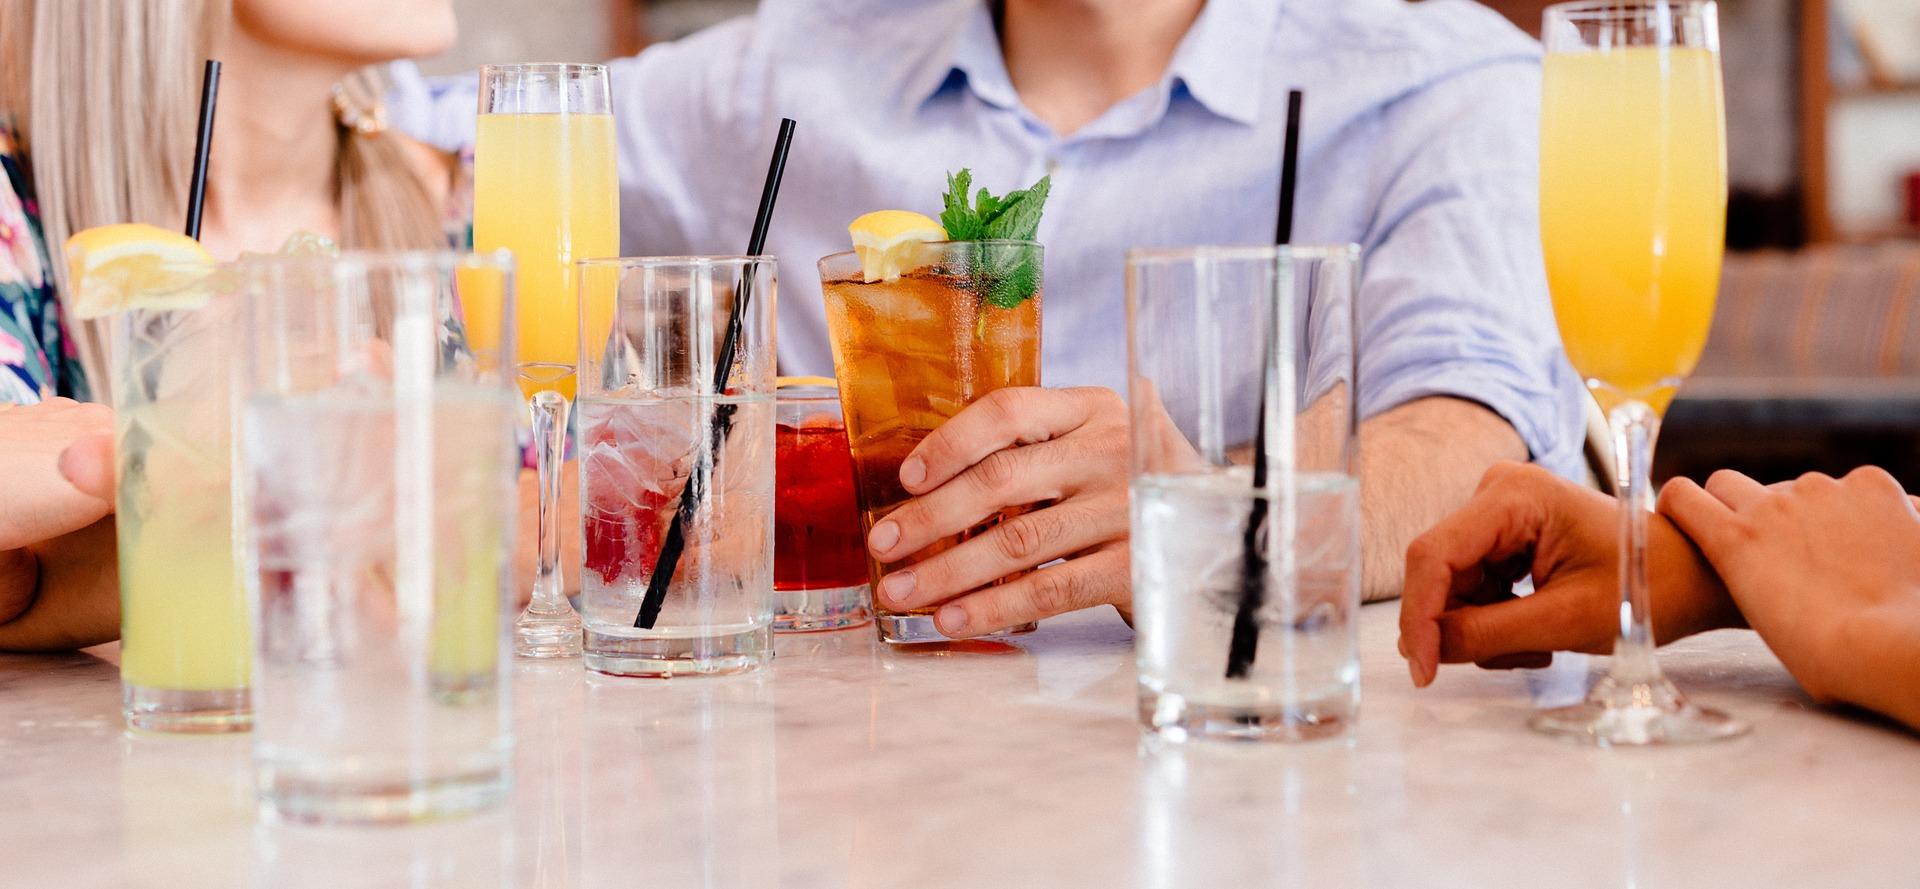 leżące na stole szklanki i napoje